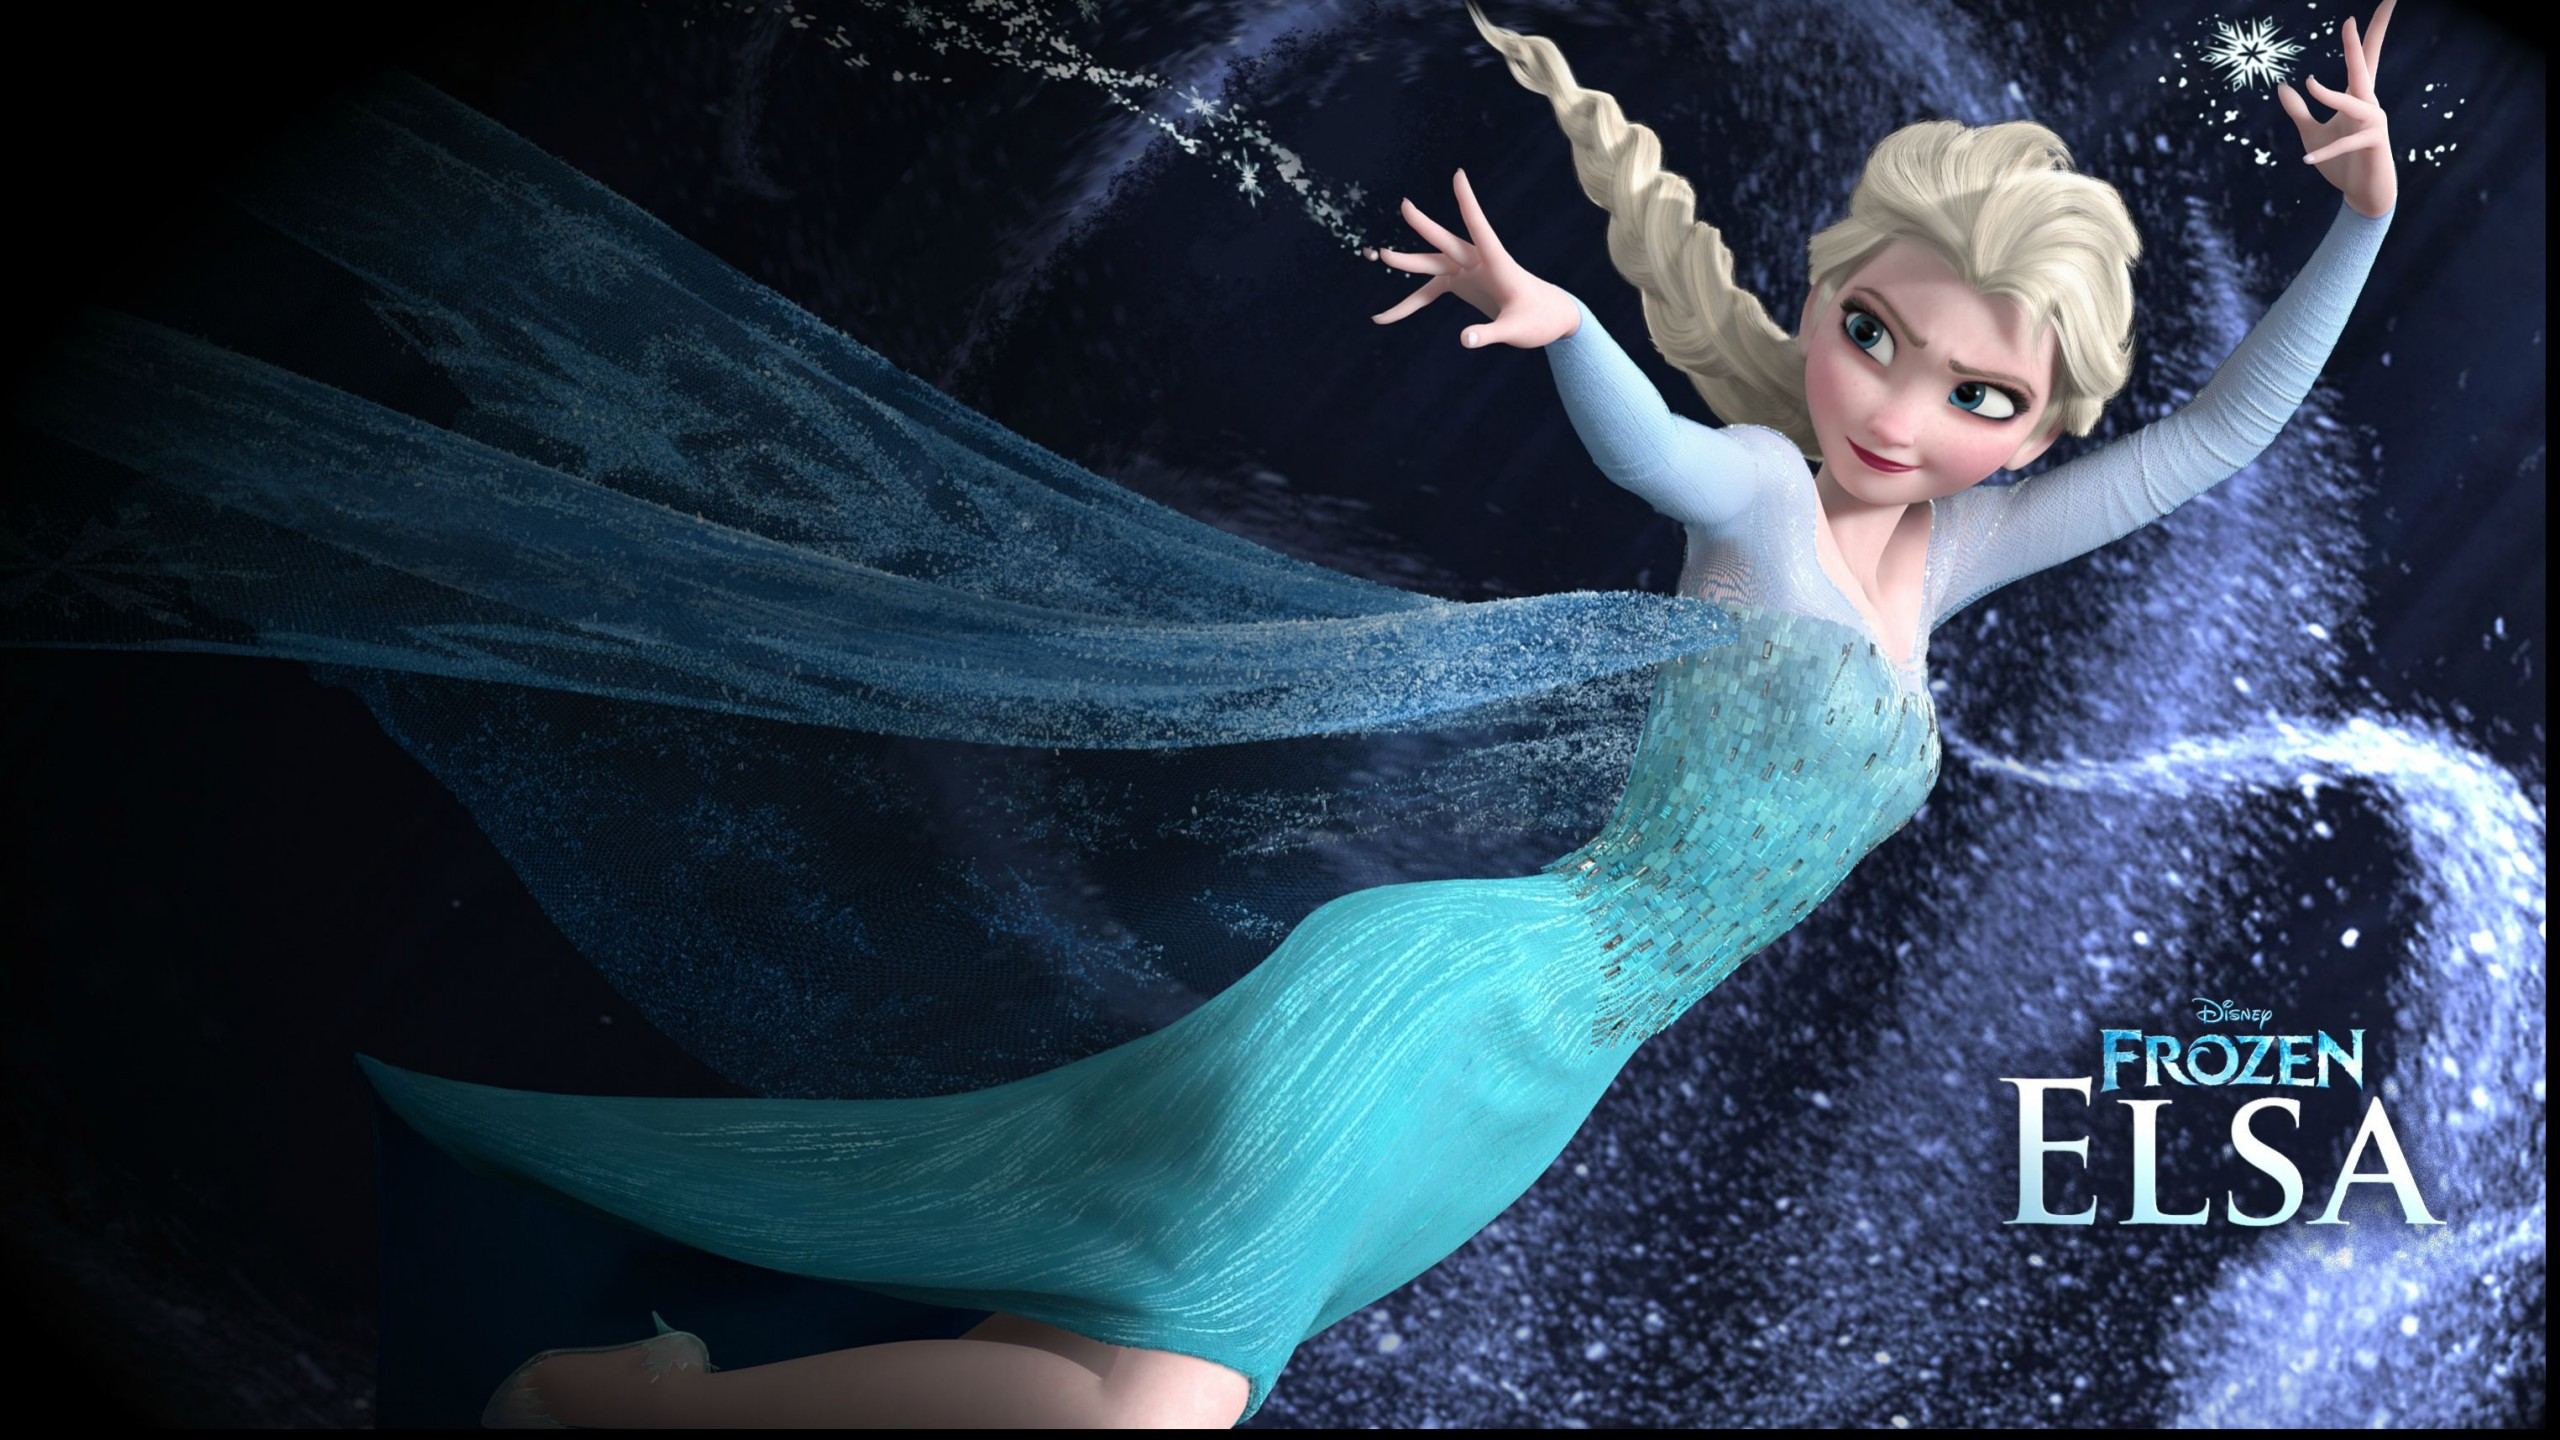 Queen Elsa From Disney Frozen Movie Wallpaper 2572 Frenziacom Pictures 2560x1440